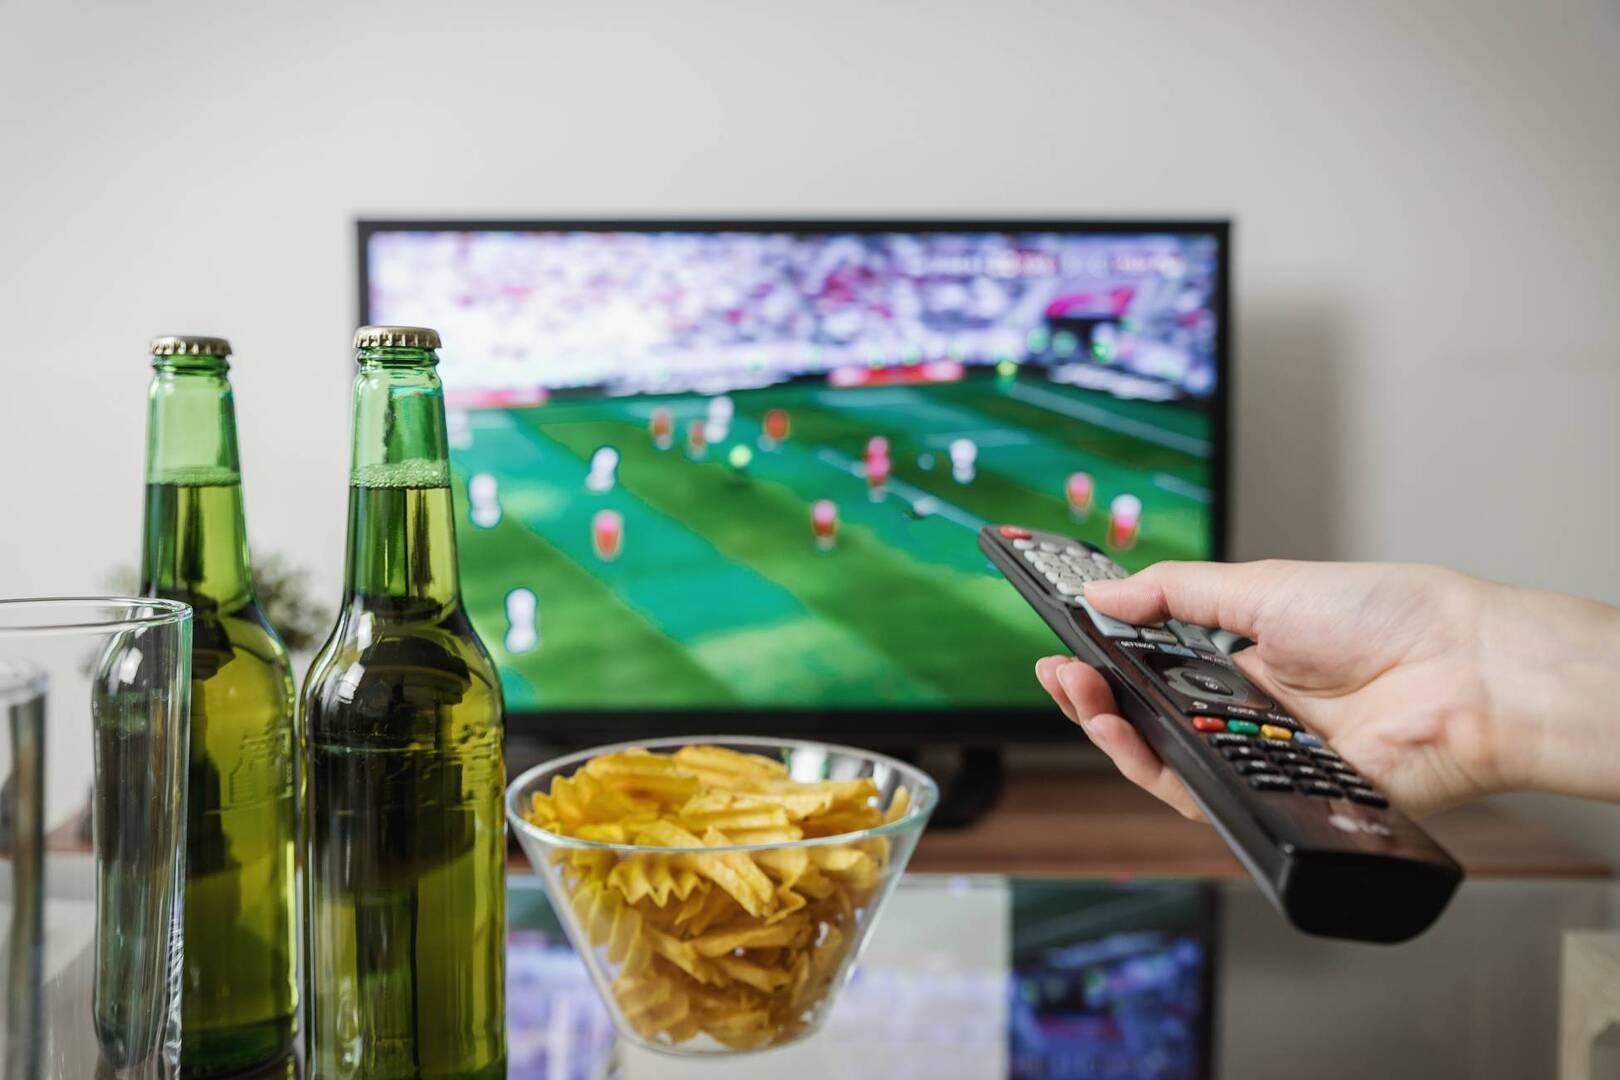 SuperBowl Ads Beer and Chips